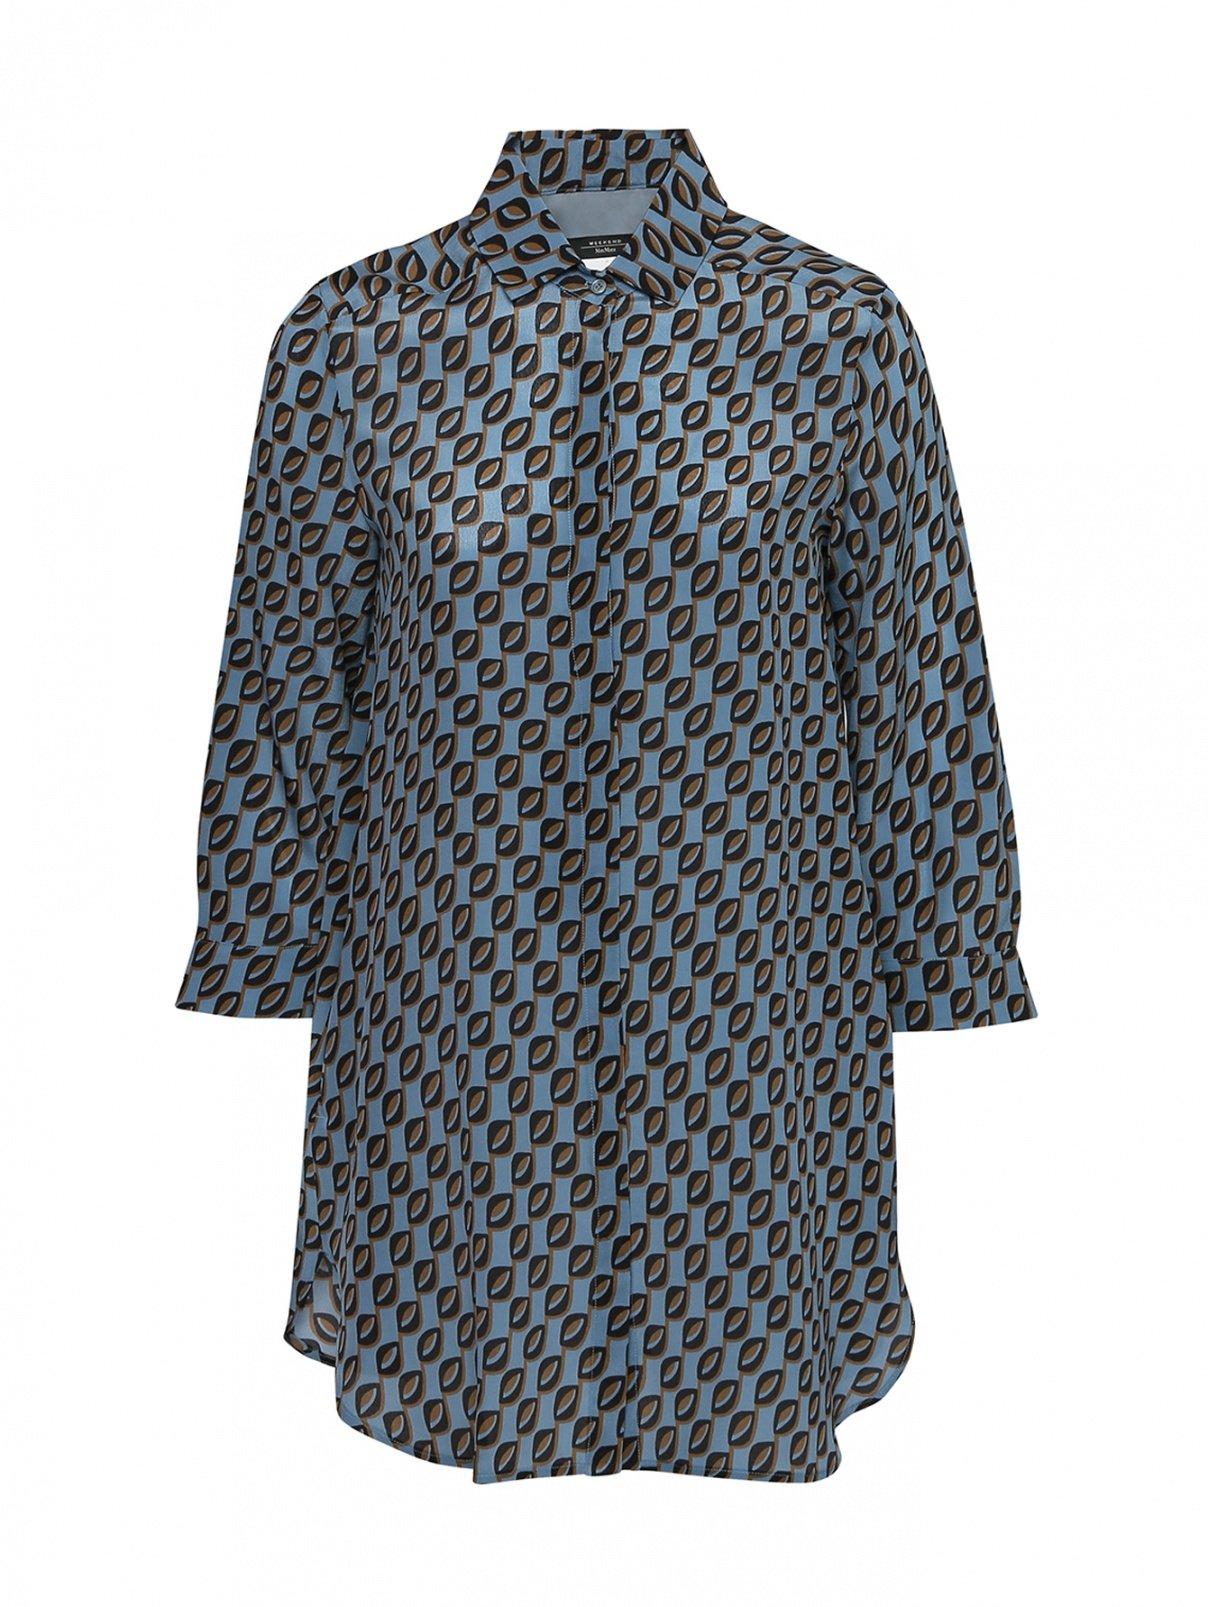 Блуза шелковая с узором Weekend Max Mara  –  Общий вид